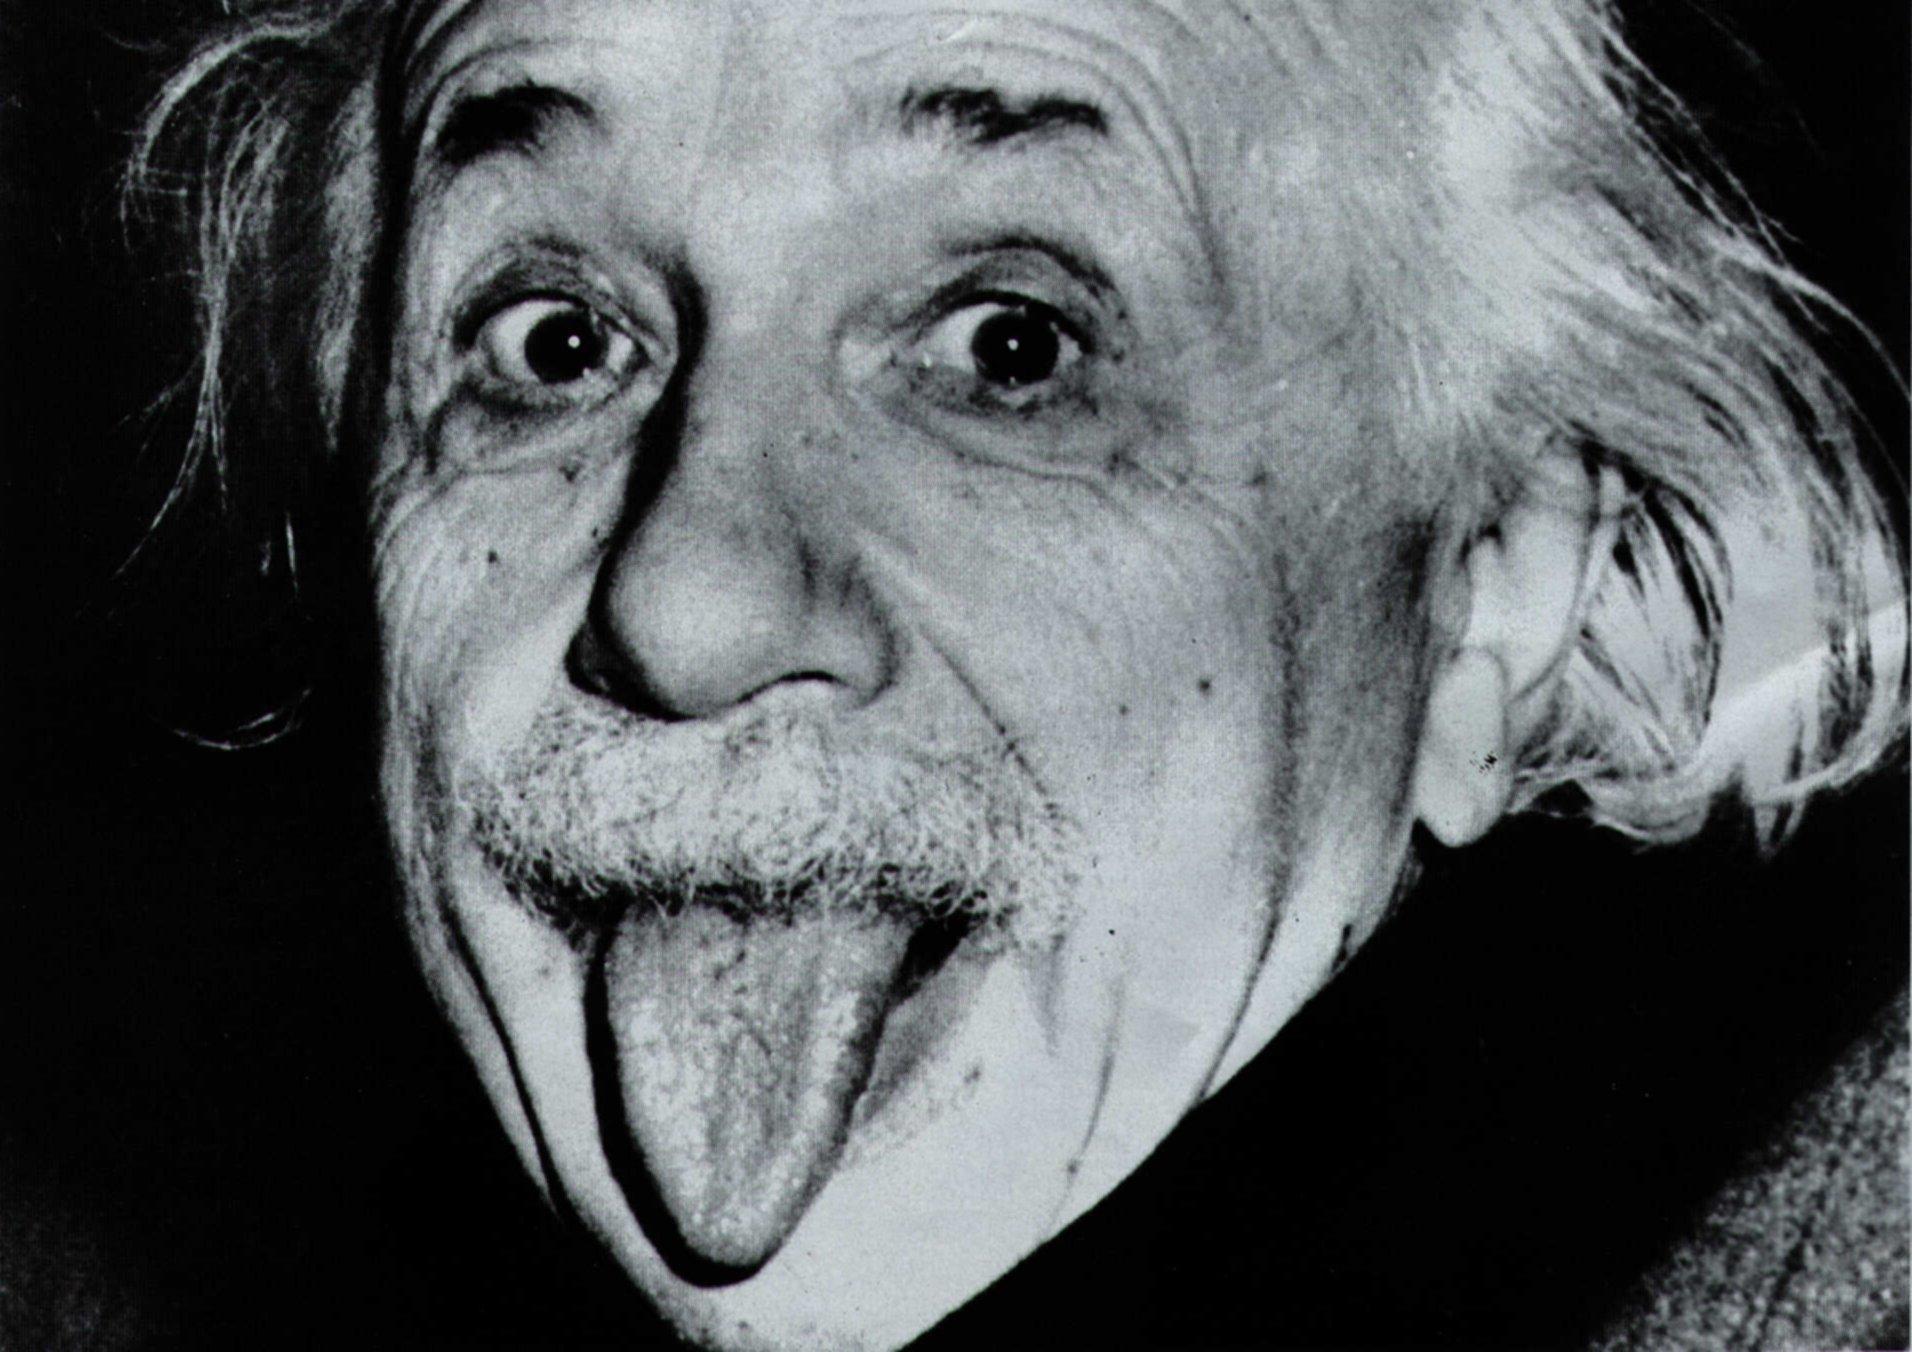 Was Science Einstein's God? An Interview with Ron Howard and Gigi Pritzker on the Faith of Albert Einstein